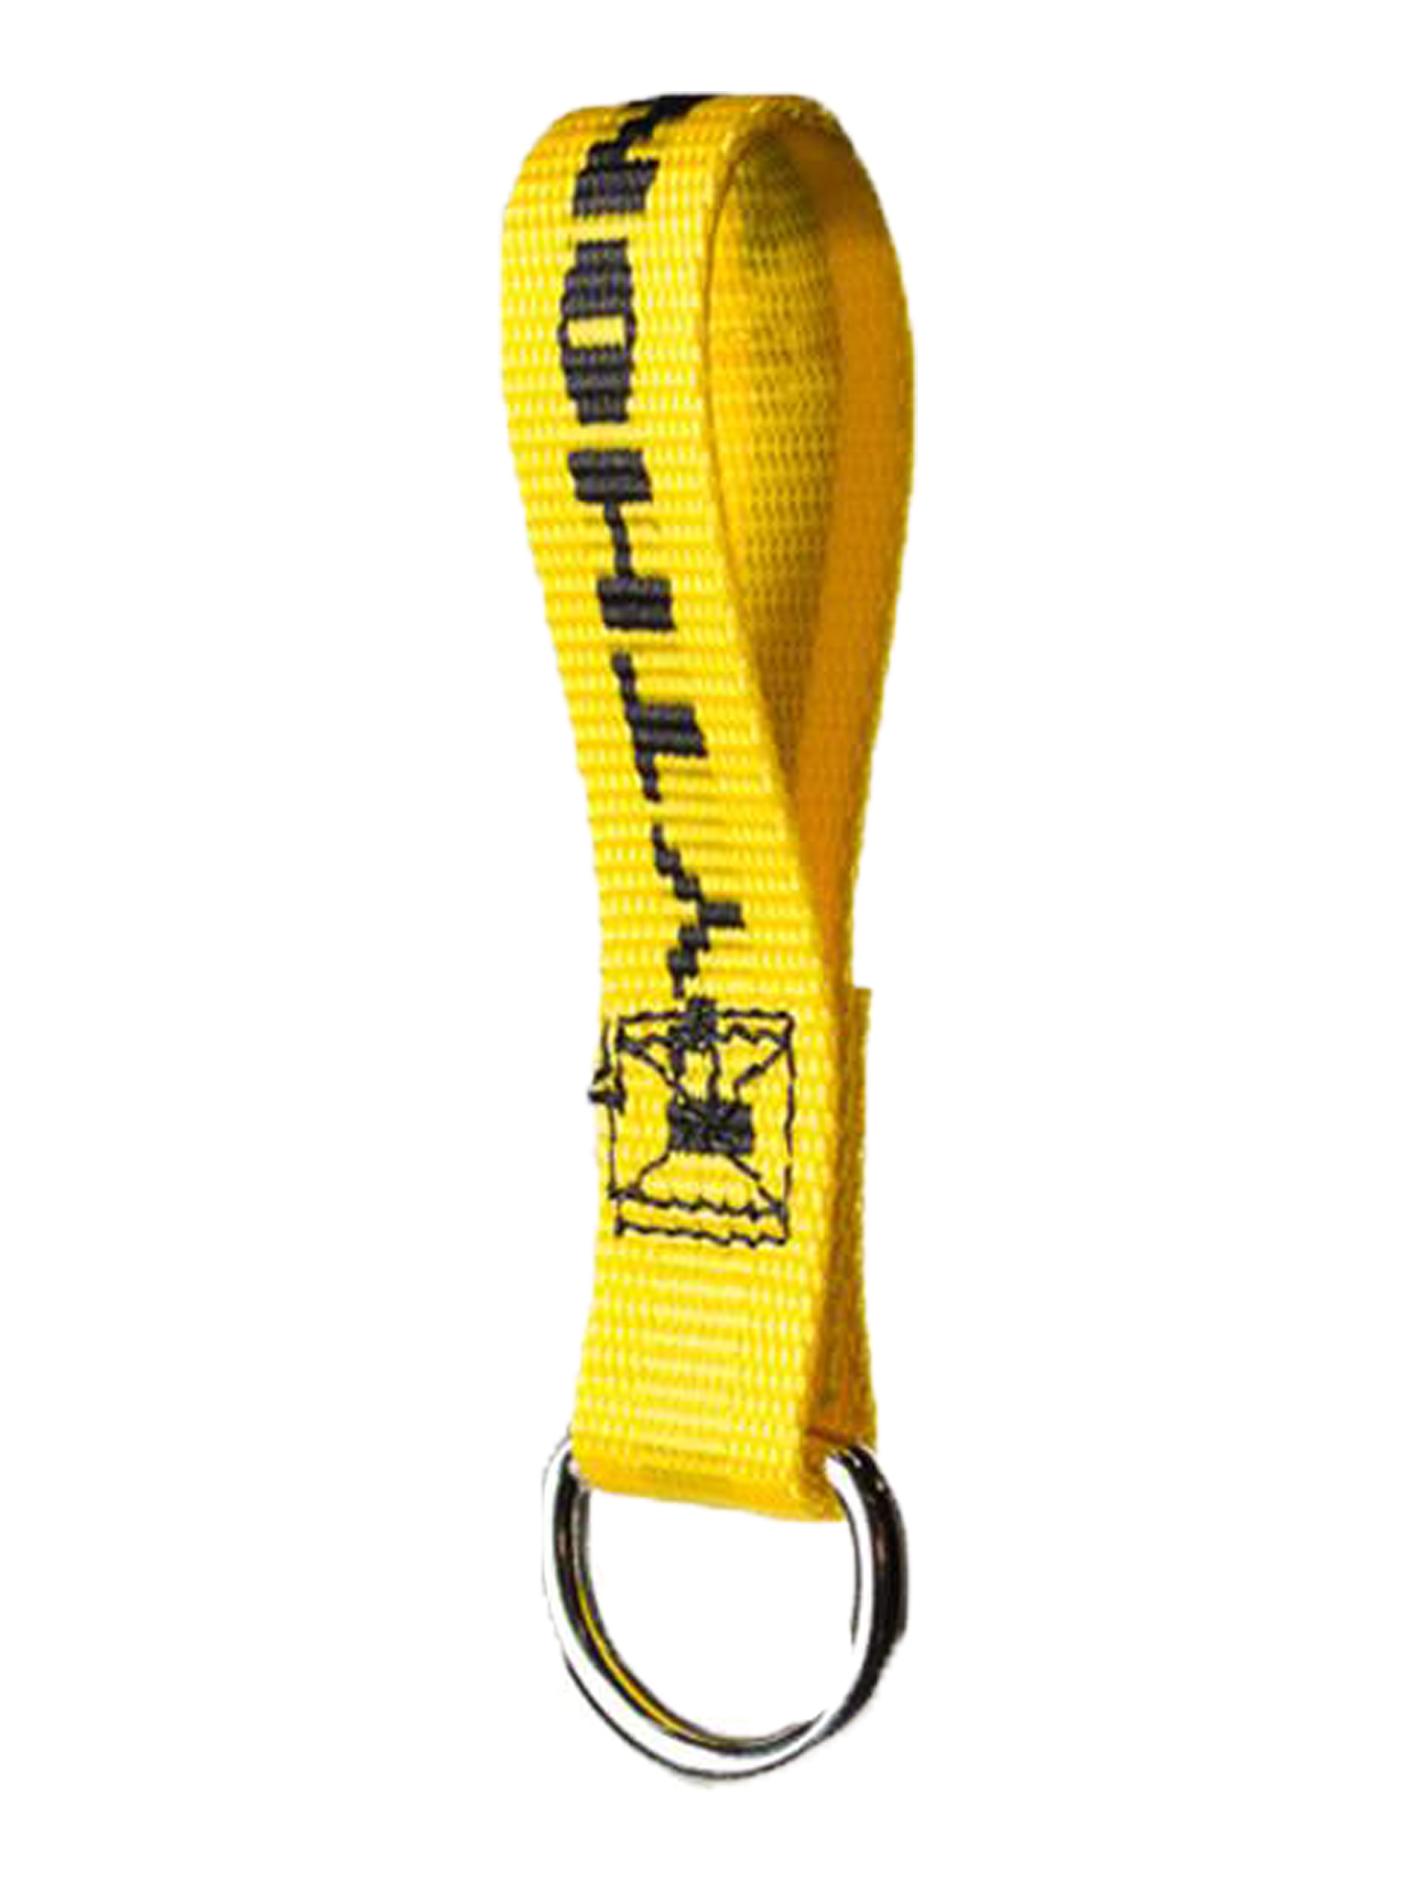 3M™ DBI-SALA® Belt Loops